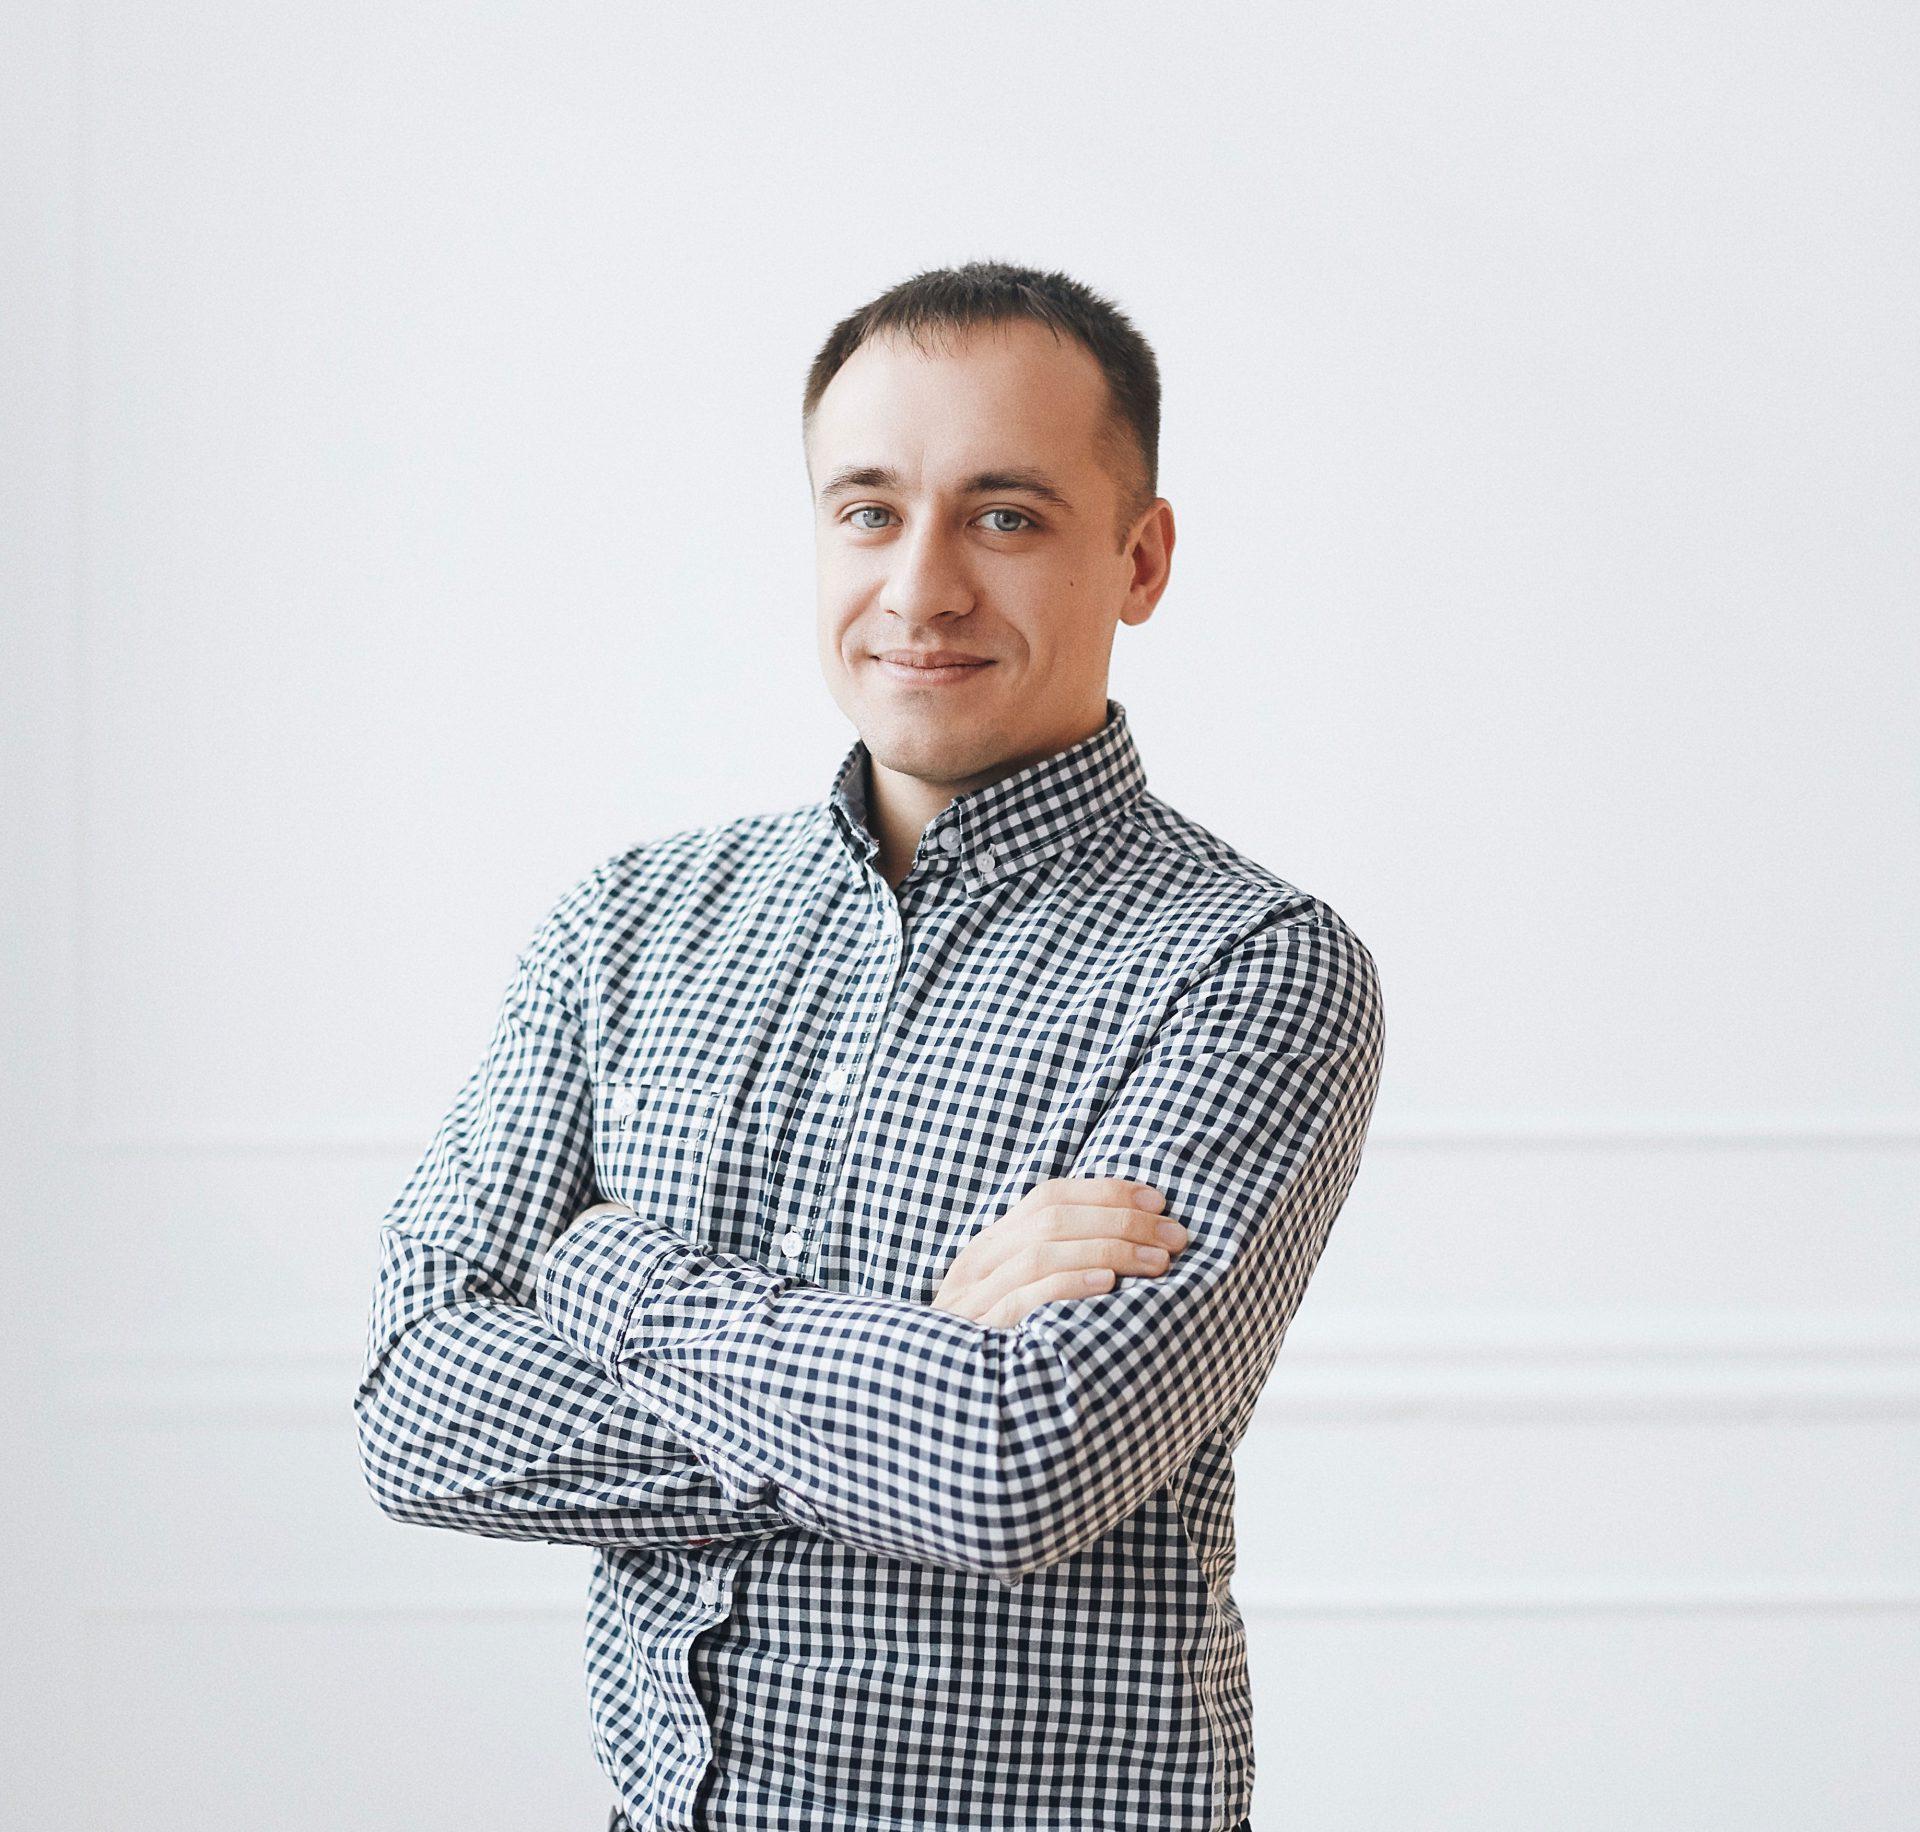 Oleksiy Kuryliak - Marketing Consultant and Strategist